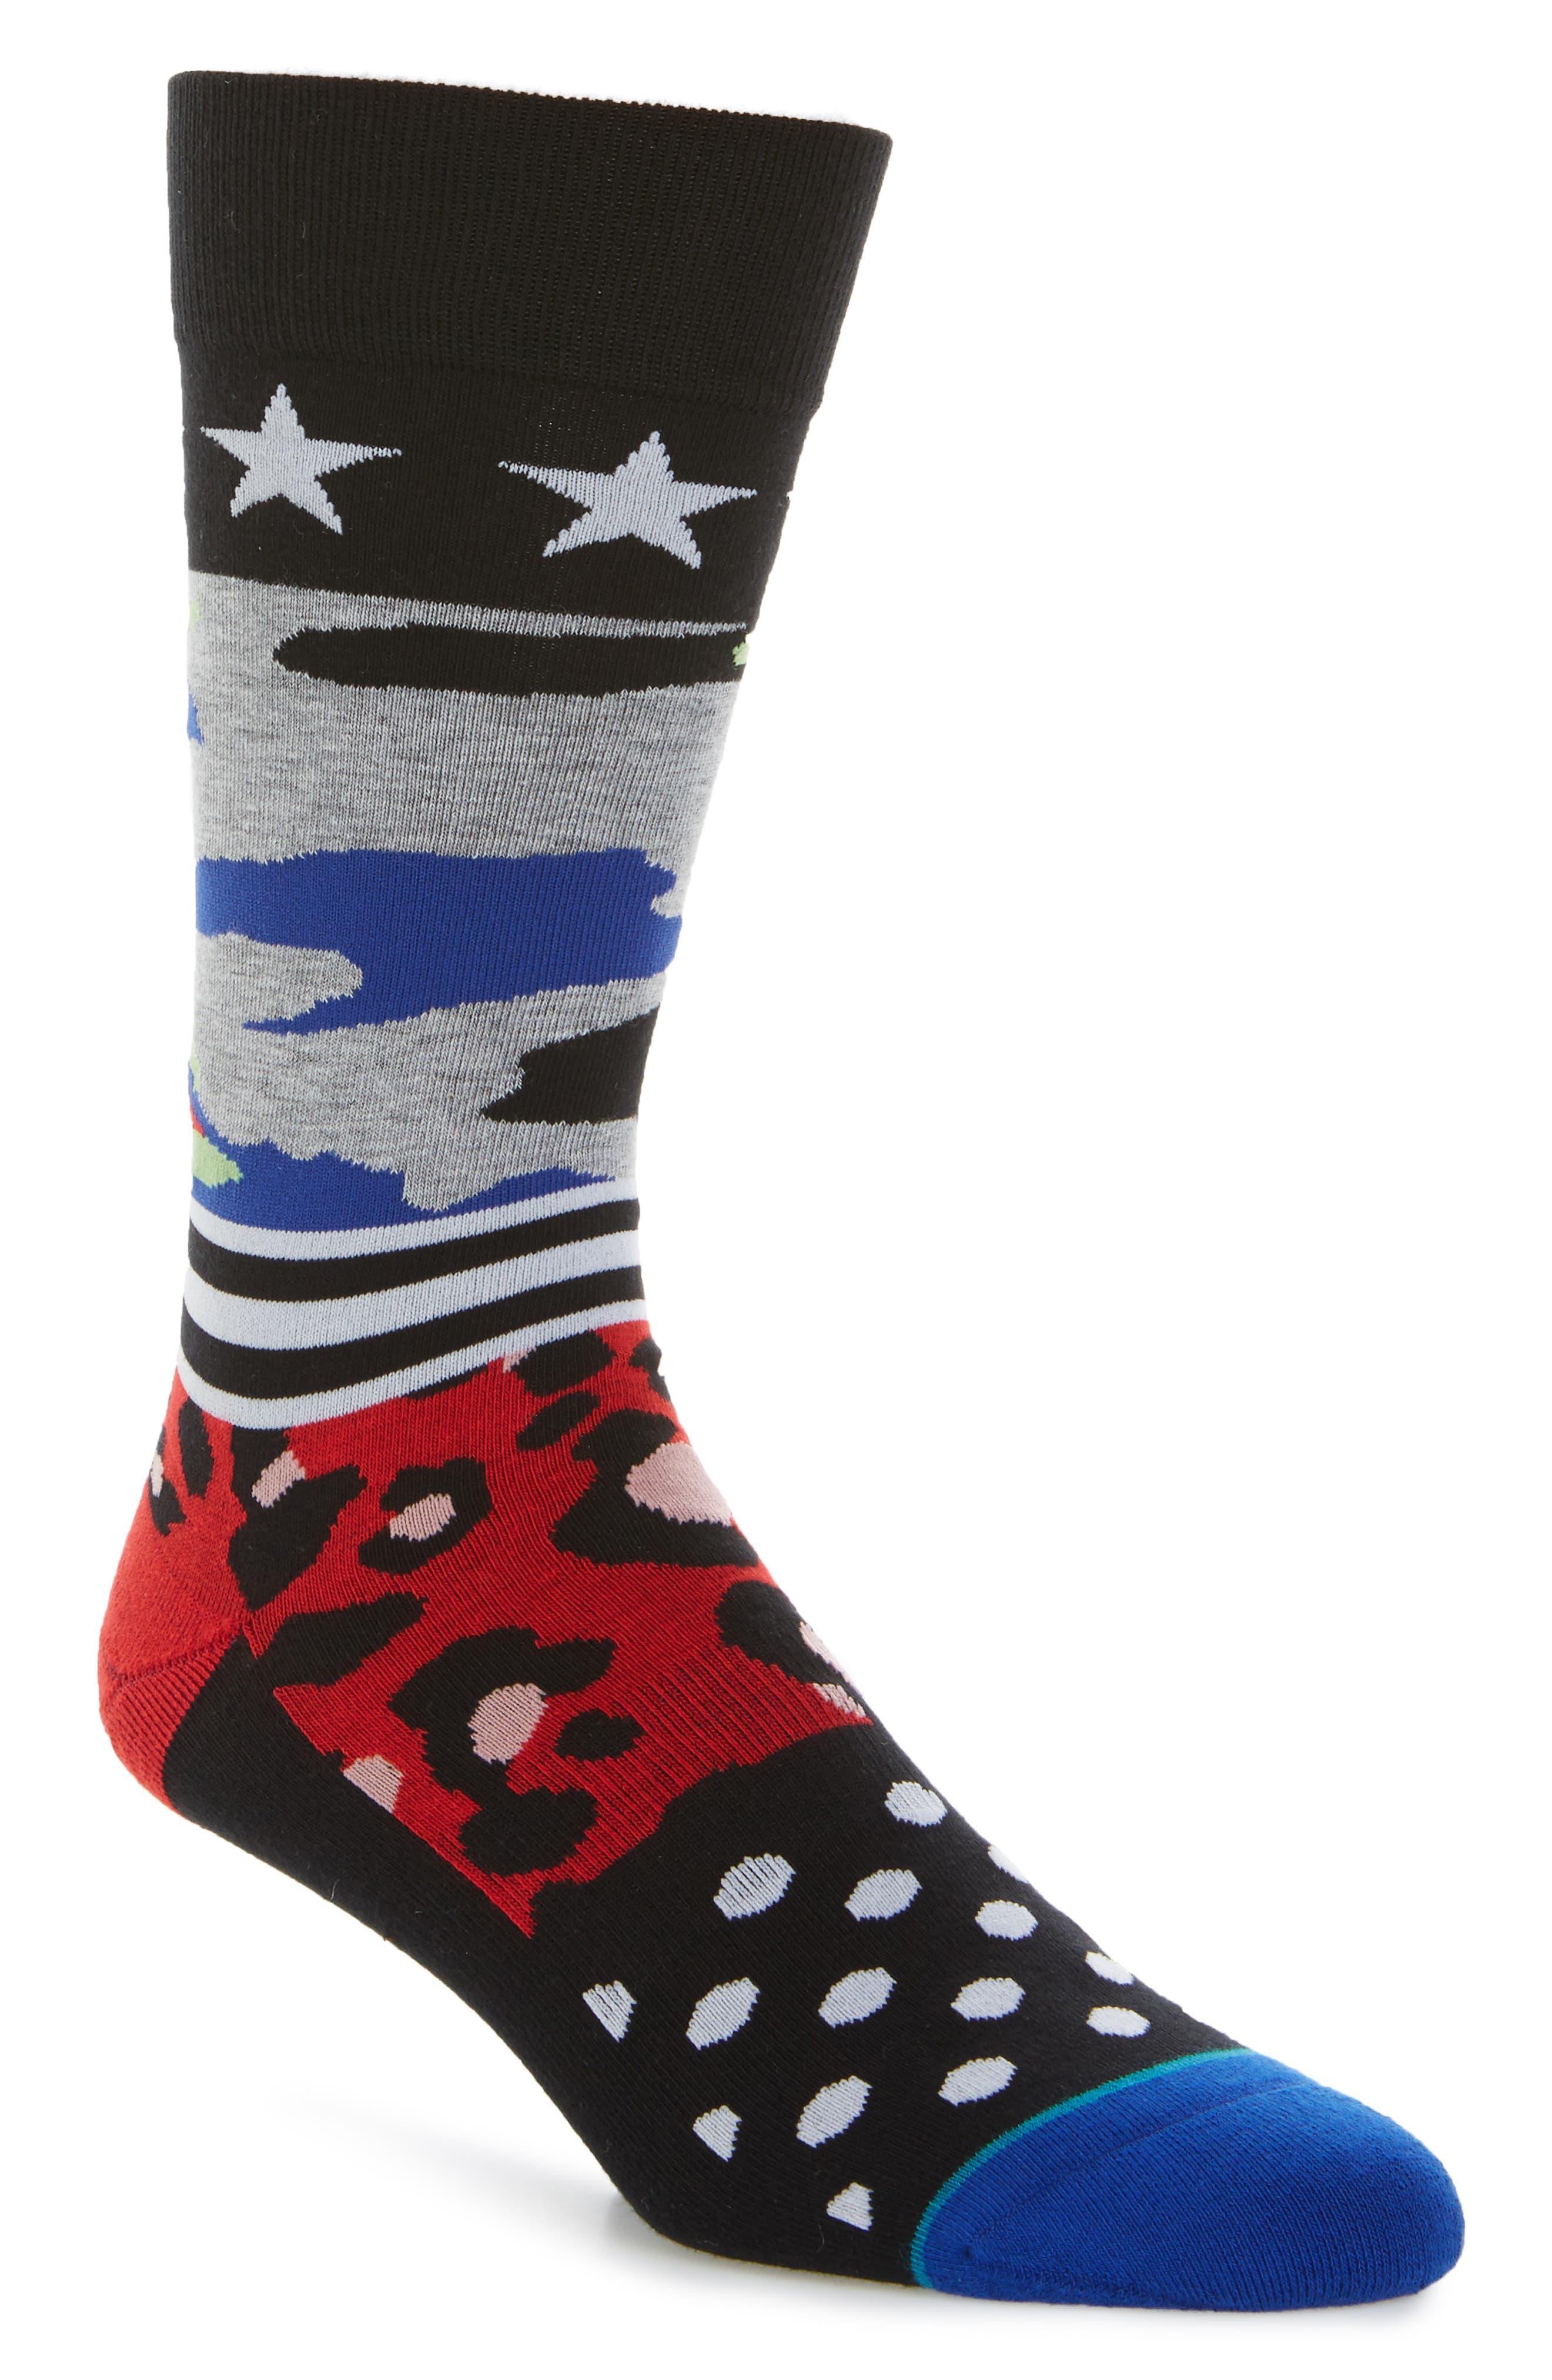 Harden Mixer Socks,                         Main,                         color, Black